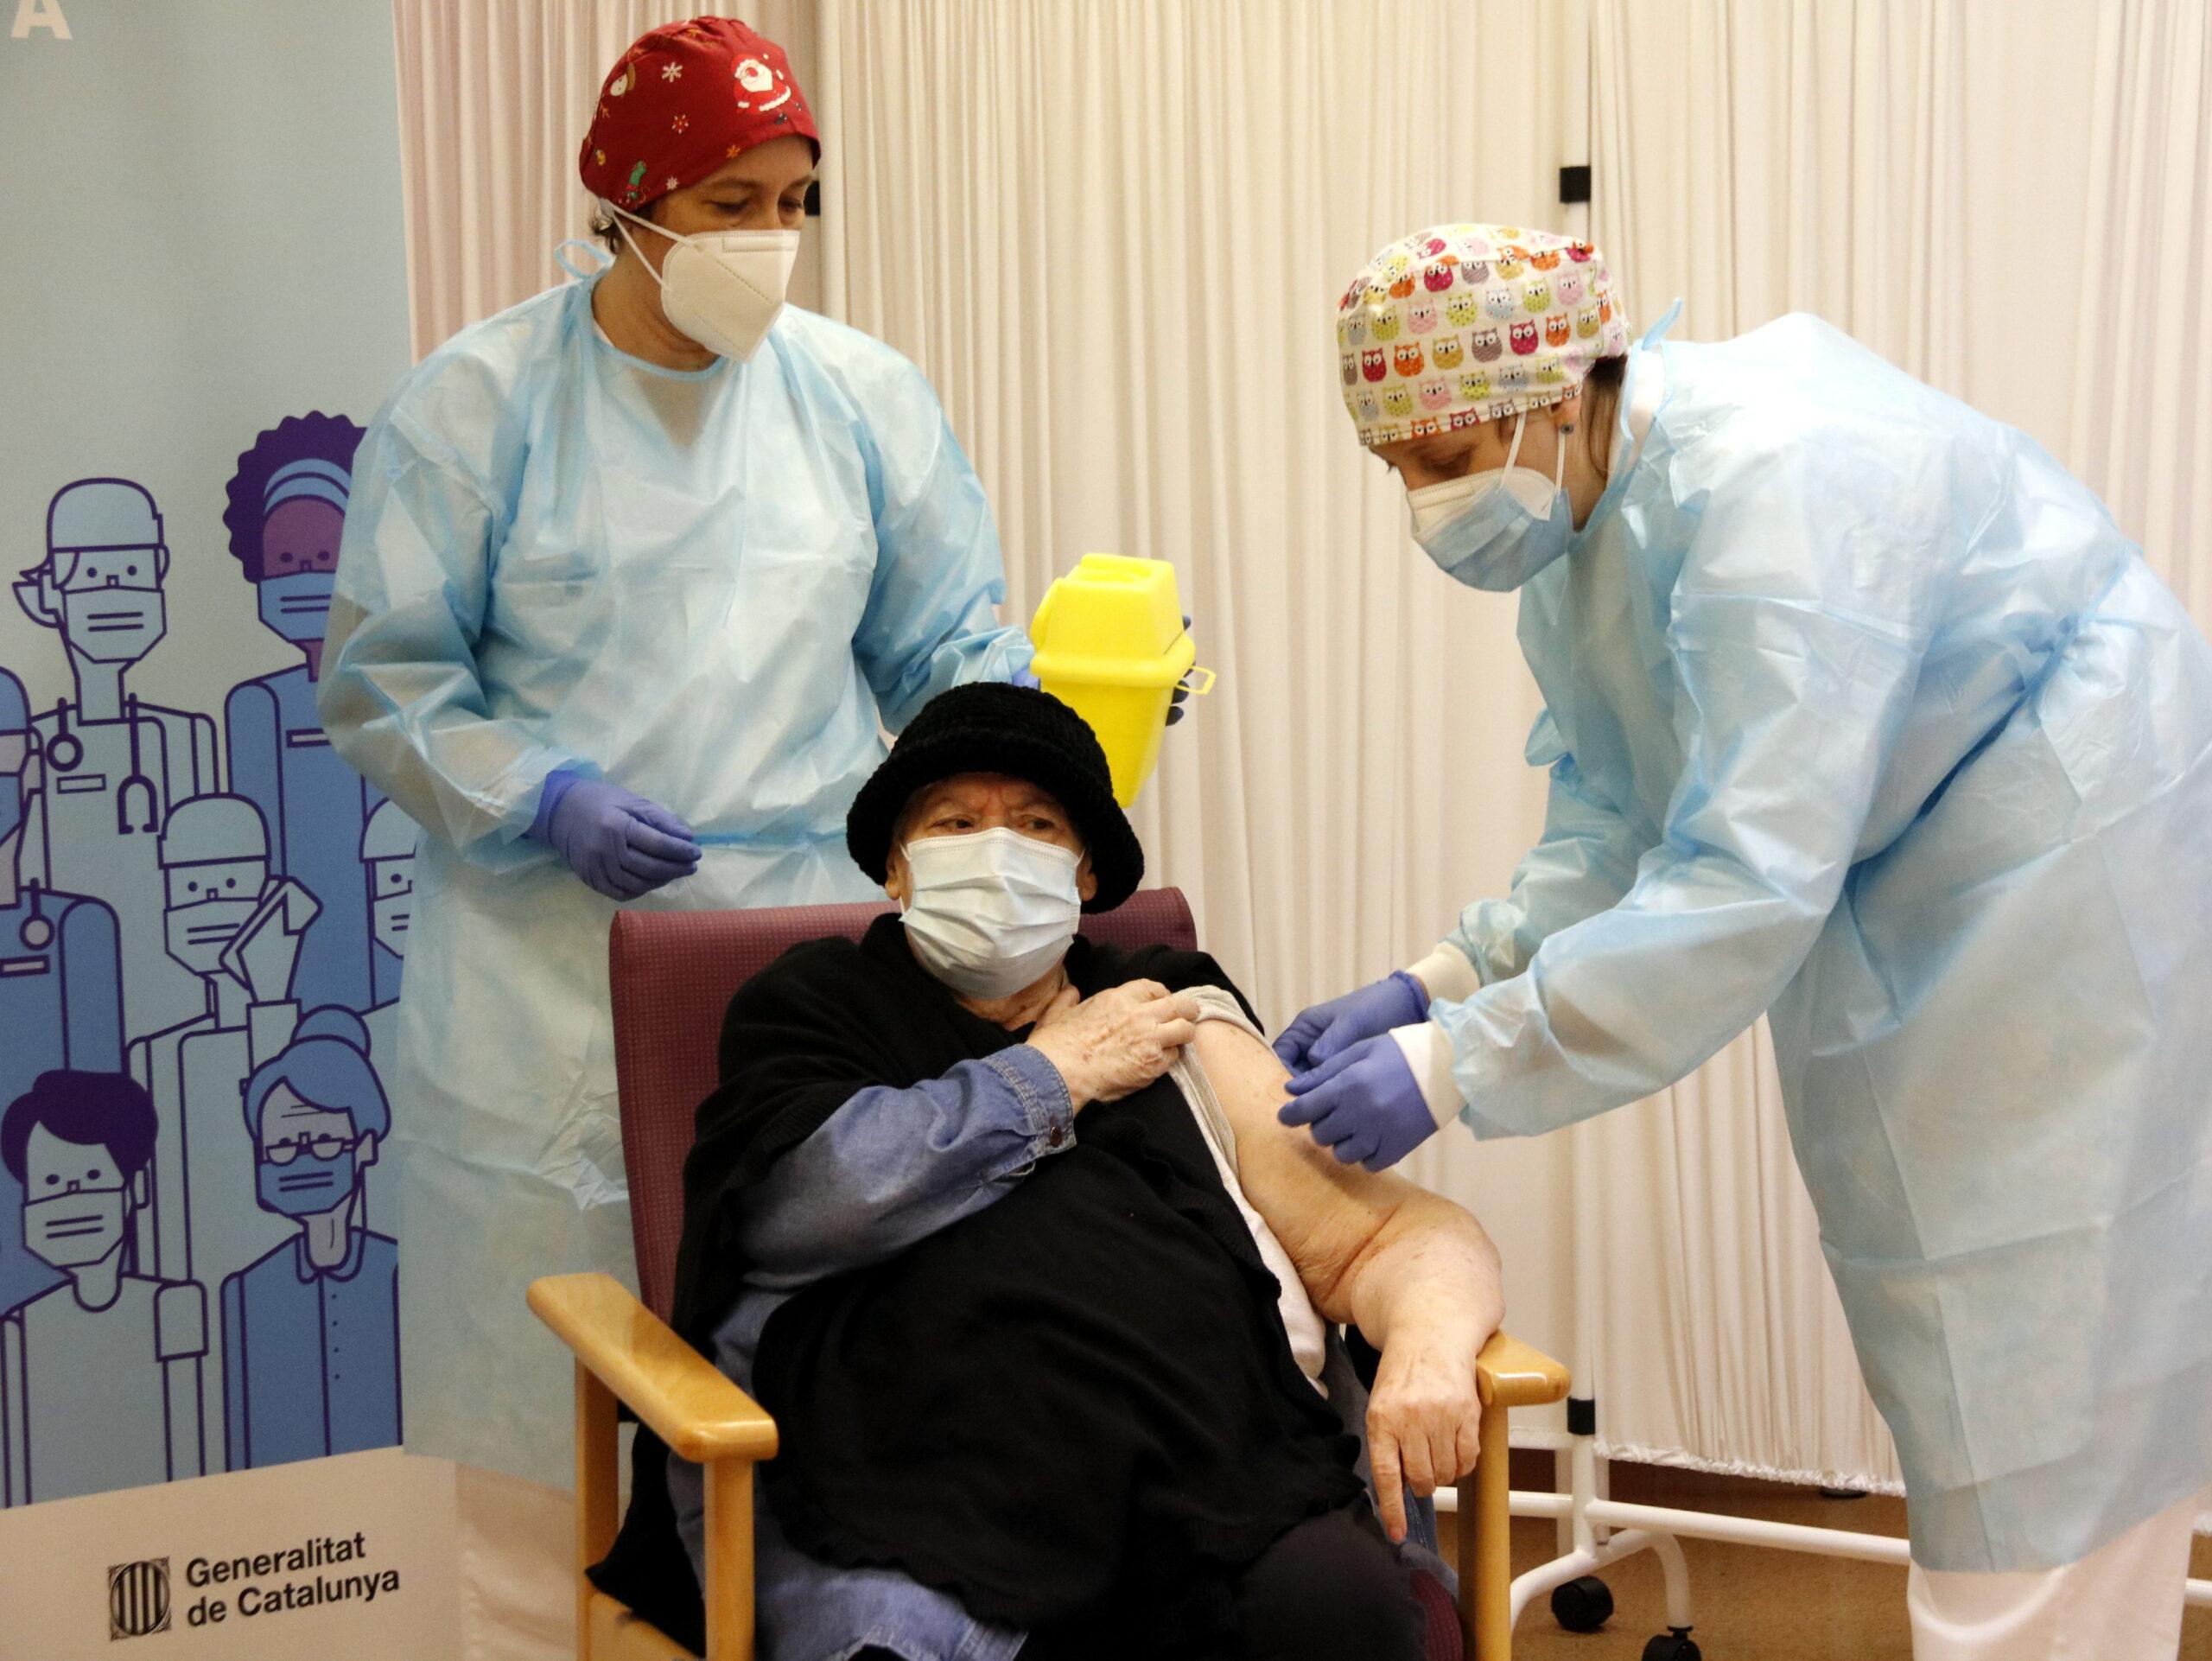 Milagros Garcia, la primera persona vacunada de la demarcació de Lleida, durant la vacunació a la residència Balafia I, el 27 de desembre de 2020 / ACN